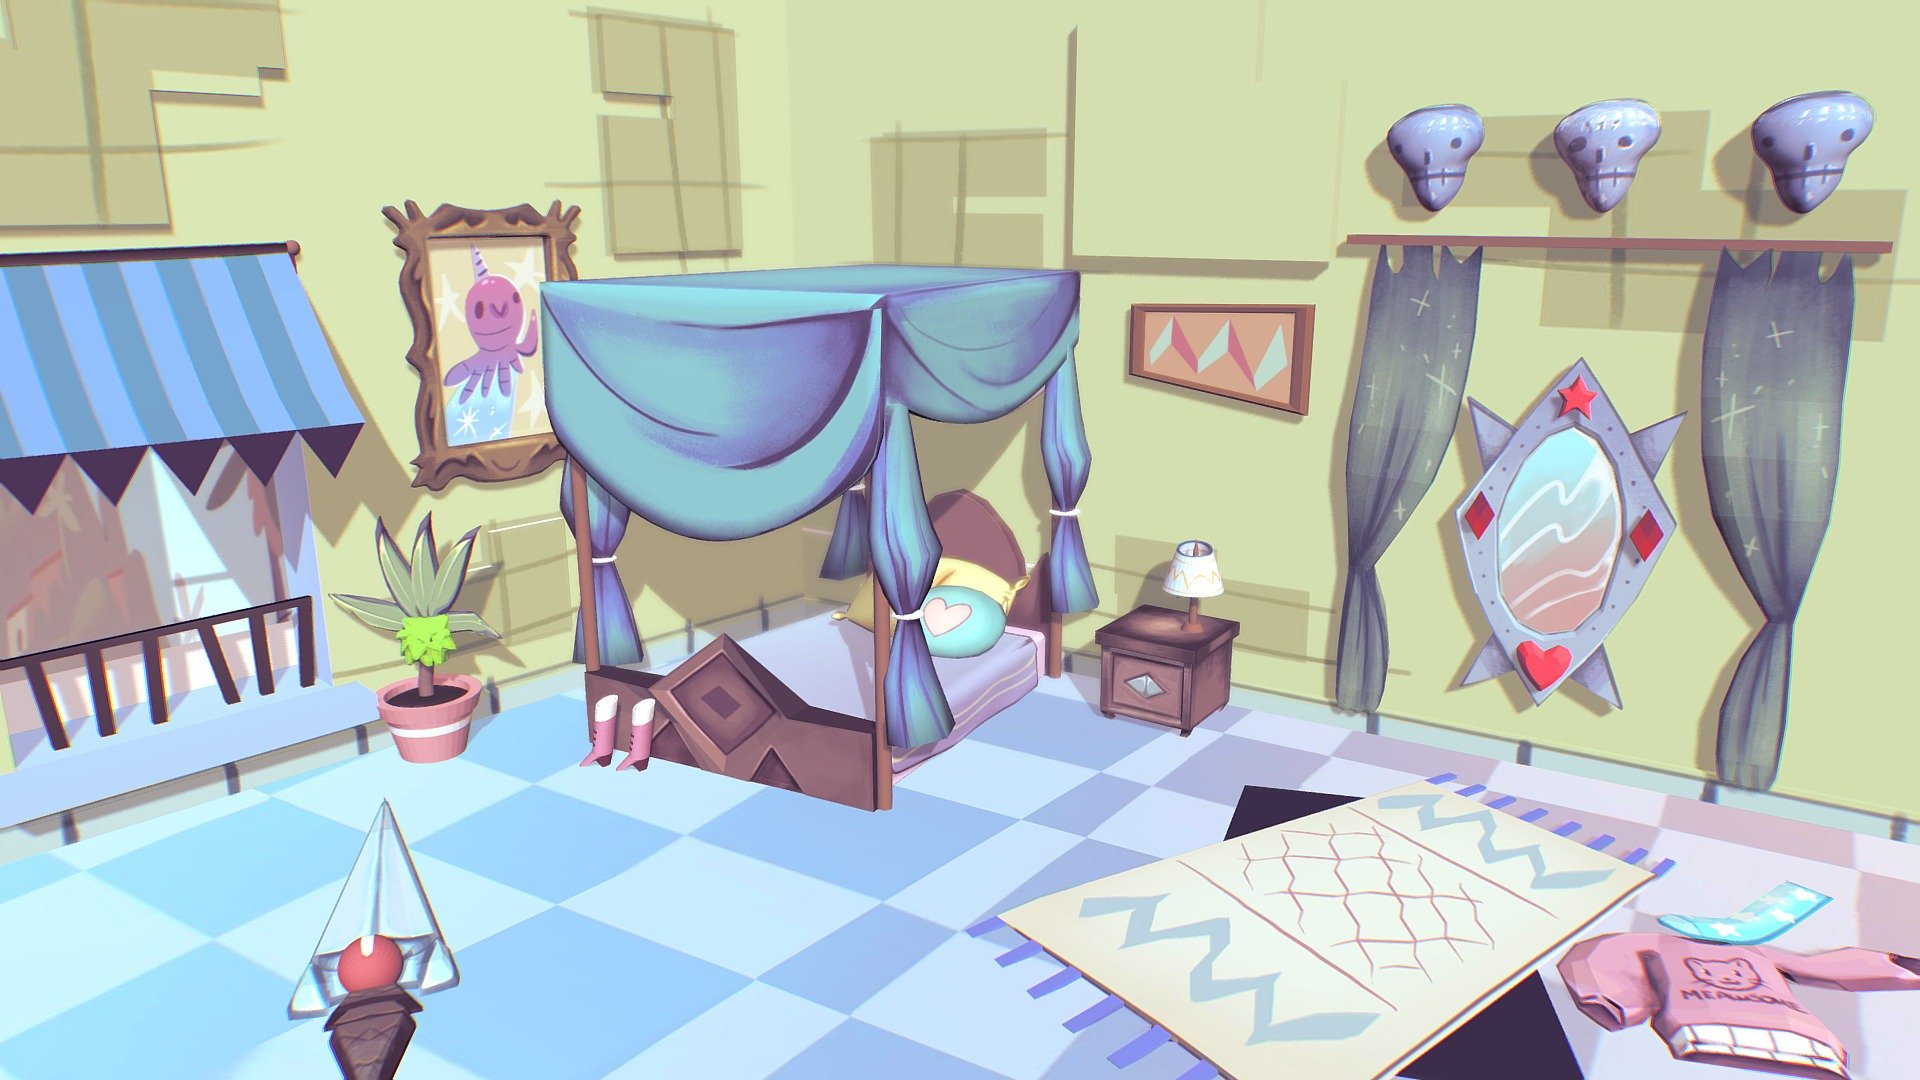 Star Butterfly Bedroom 3d Model By Stannie Stannie 93ead07 Sketchfab